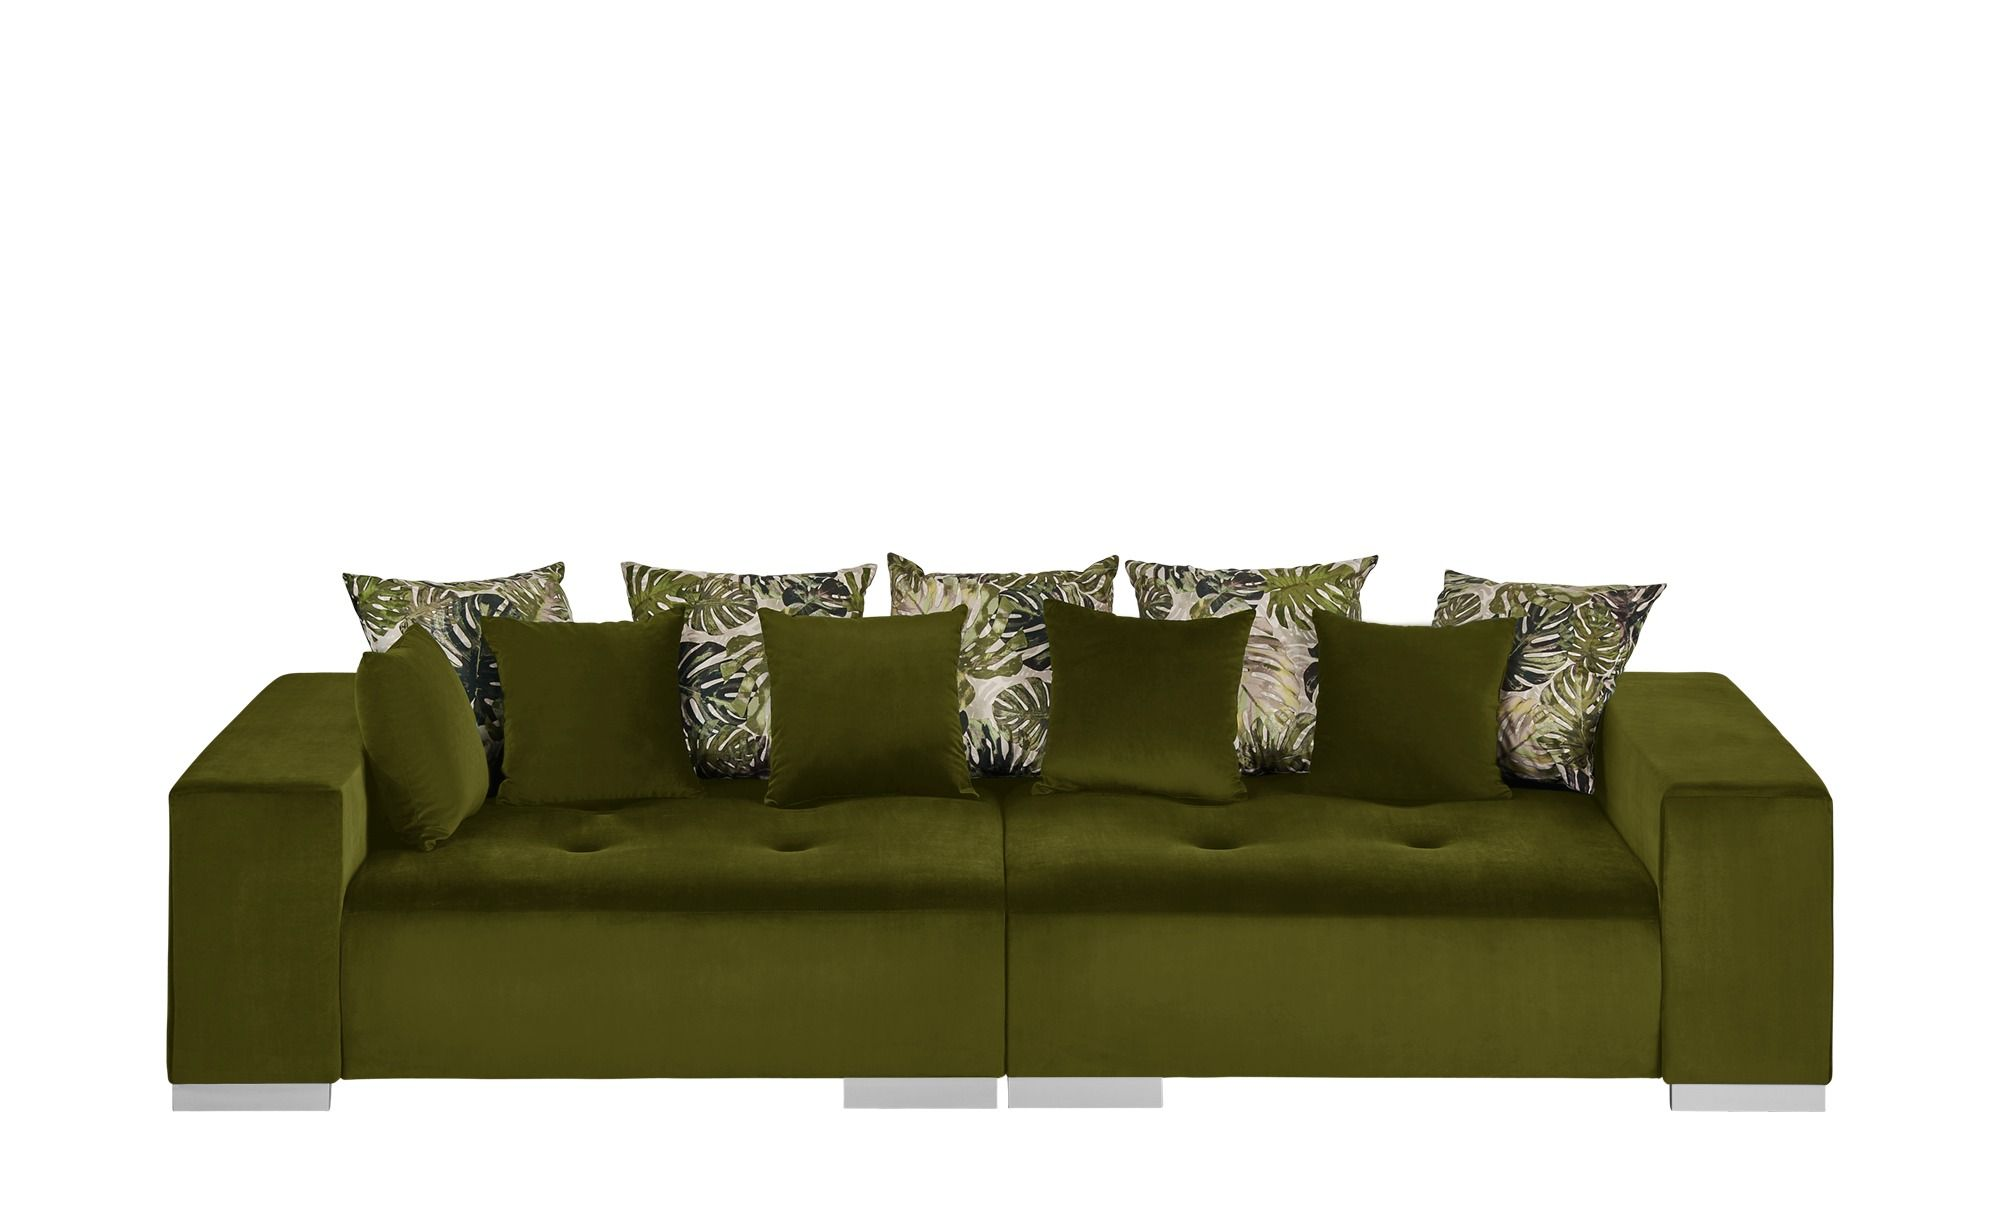 Switch Big Sofa Grun Mikrofaser Kim Grun Hoffner Grosse Sofas Sofa Billig Grunes Sofa